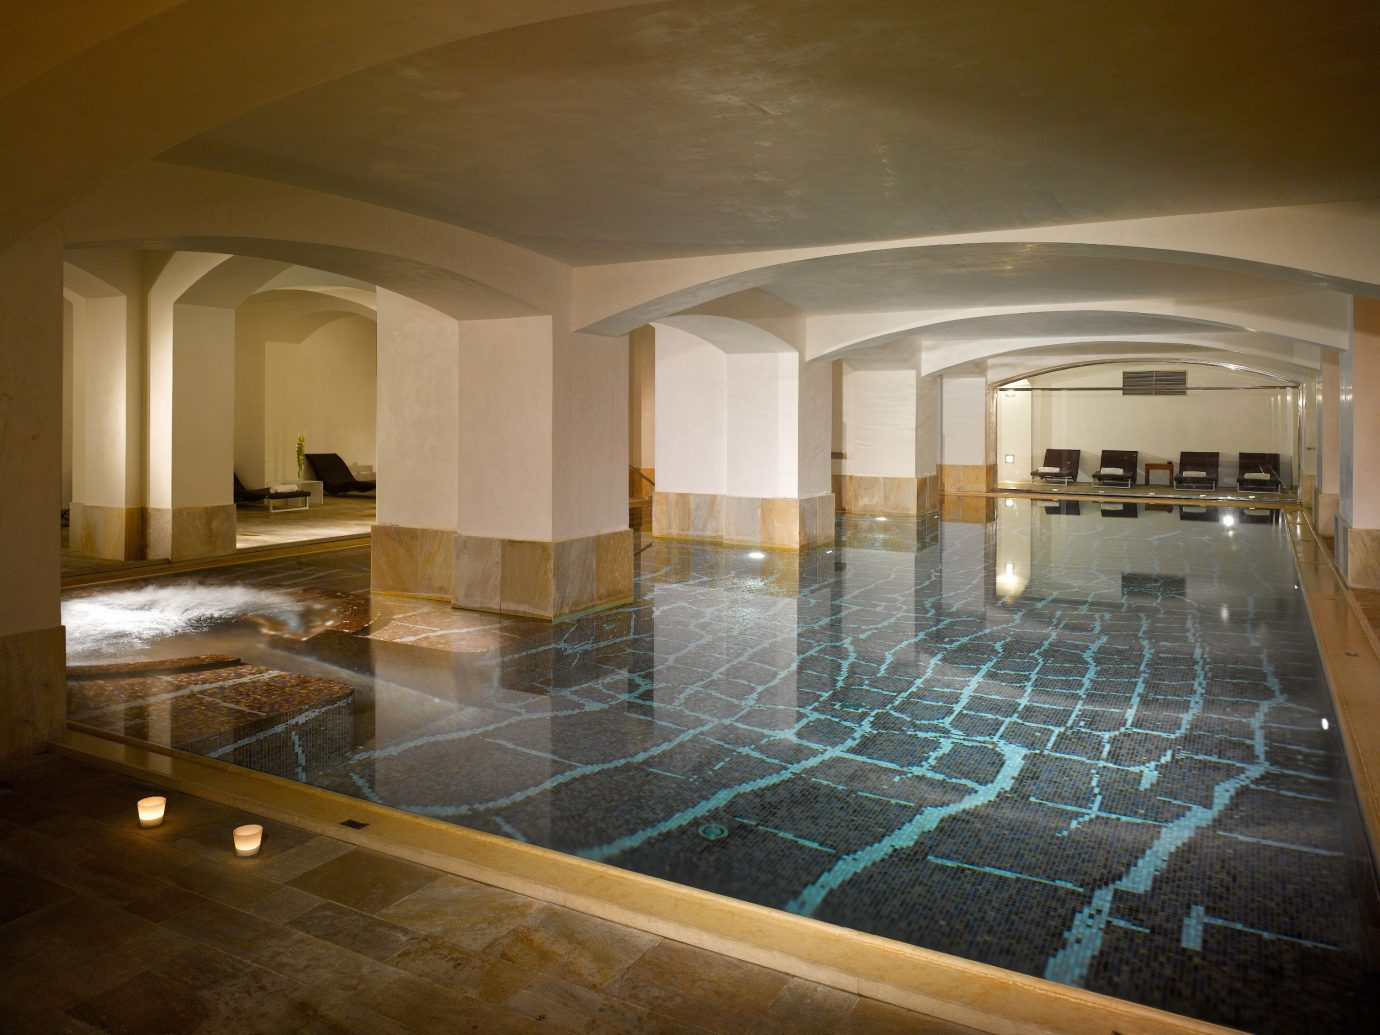 europe Hotels Prague indoor ceiling swimming pool property room estate floor Architecture Lobby mansion interior design home daylighting flooring